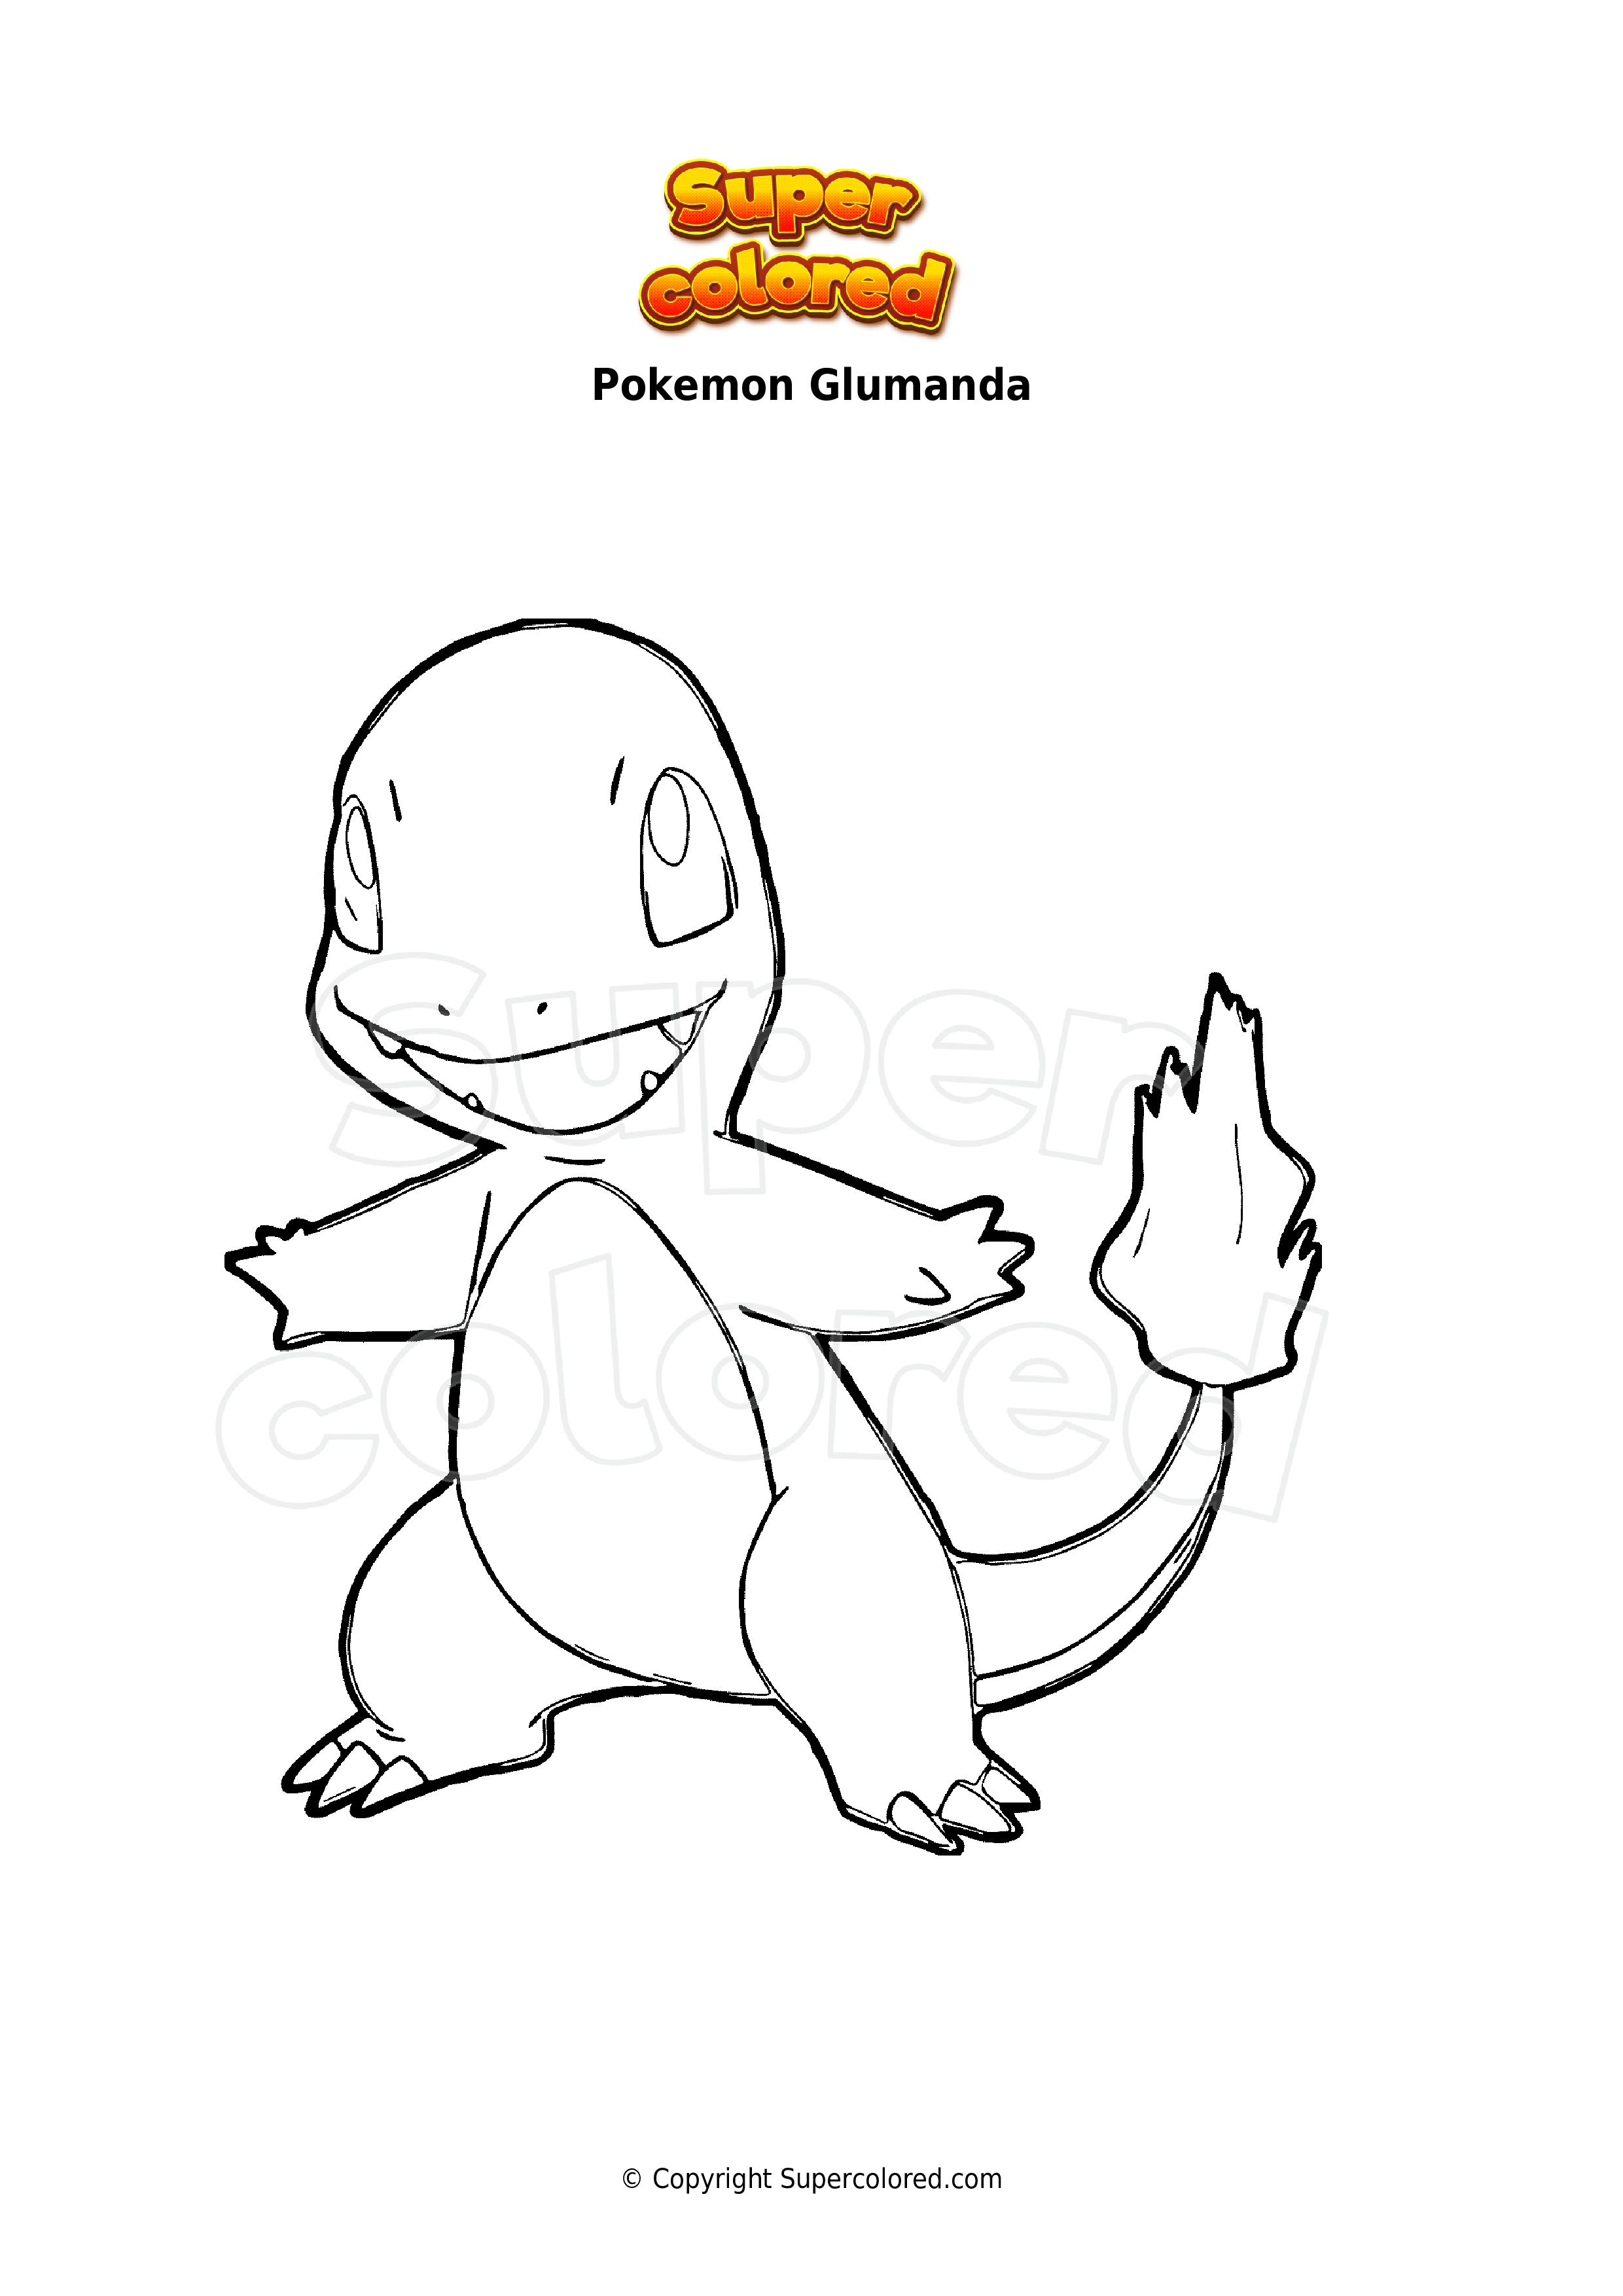 Ausmalbild Pokemon Glumanda - Supercolored.com